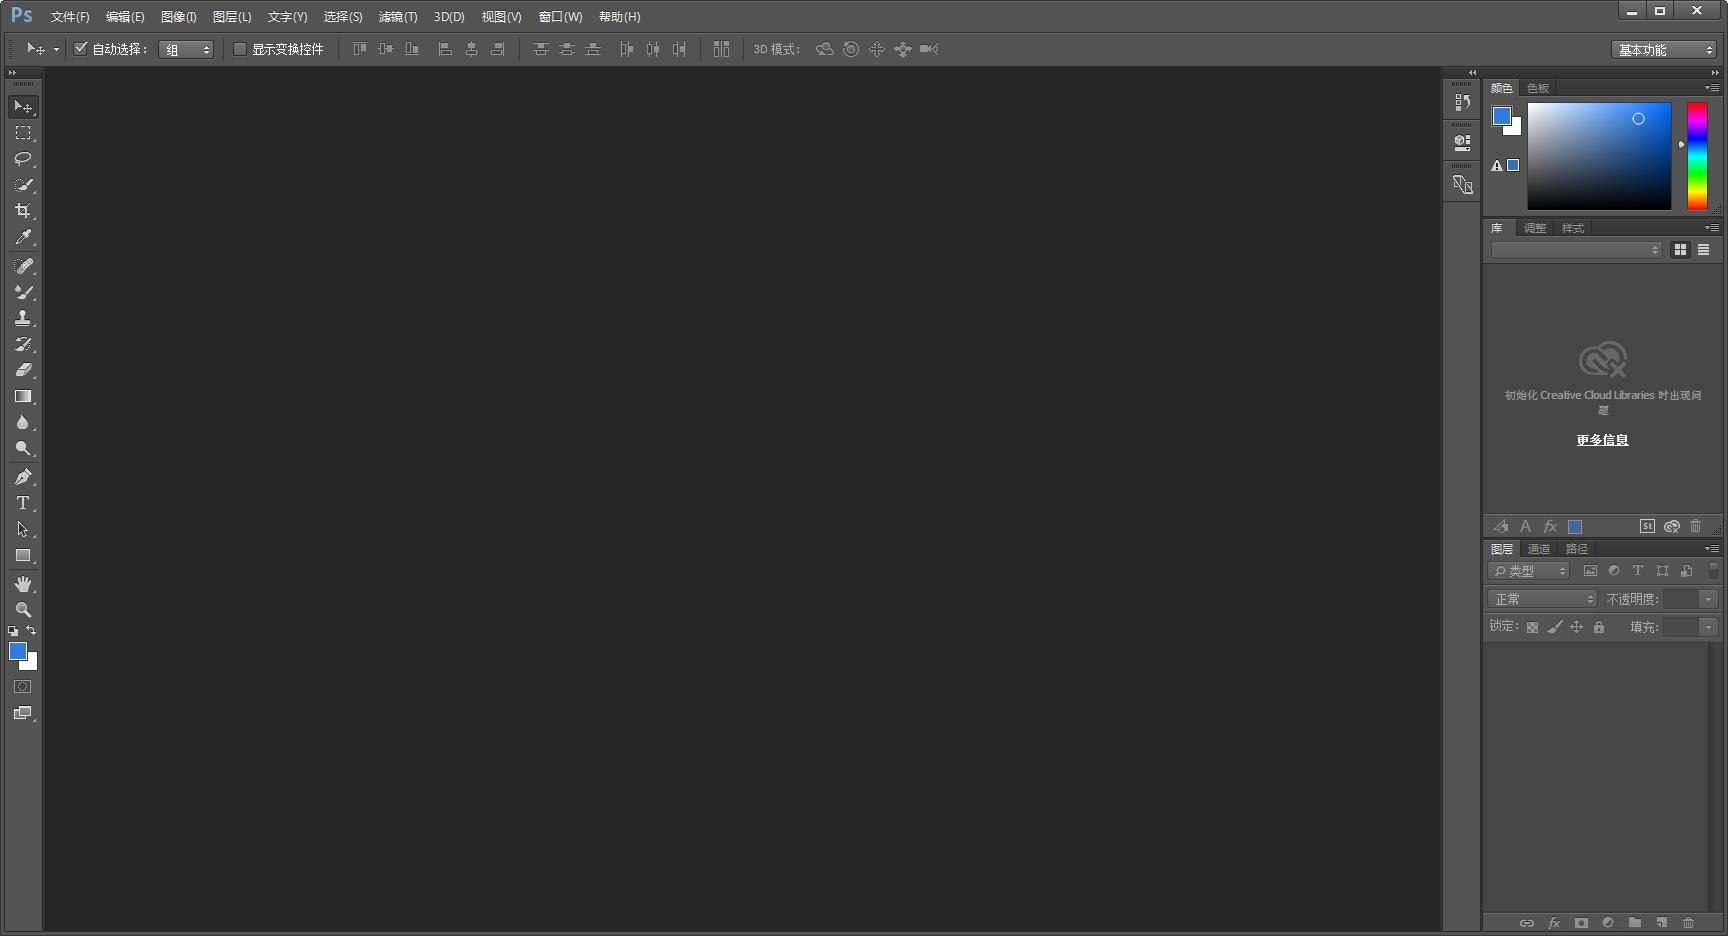 adobe photoshop cc2015【ps cc 2015破解版】官方简体中文版安装图文教程、破解注册方法